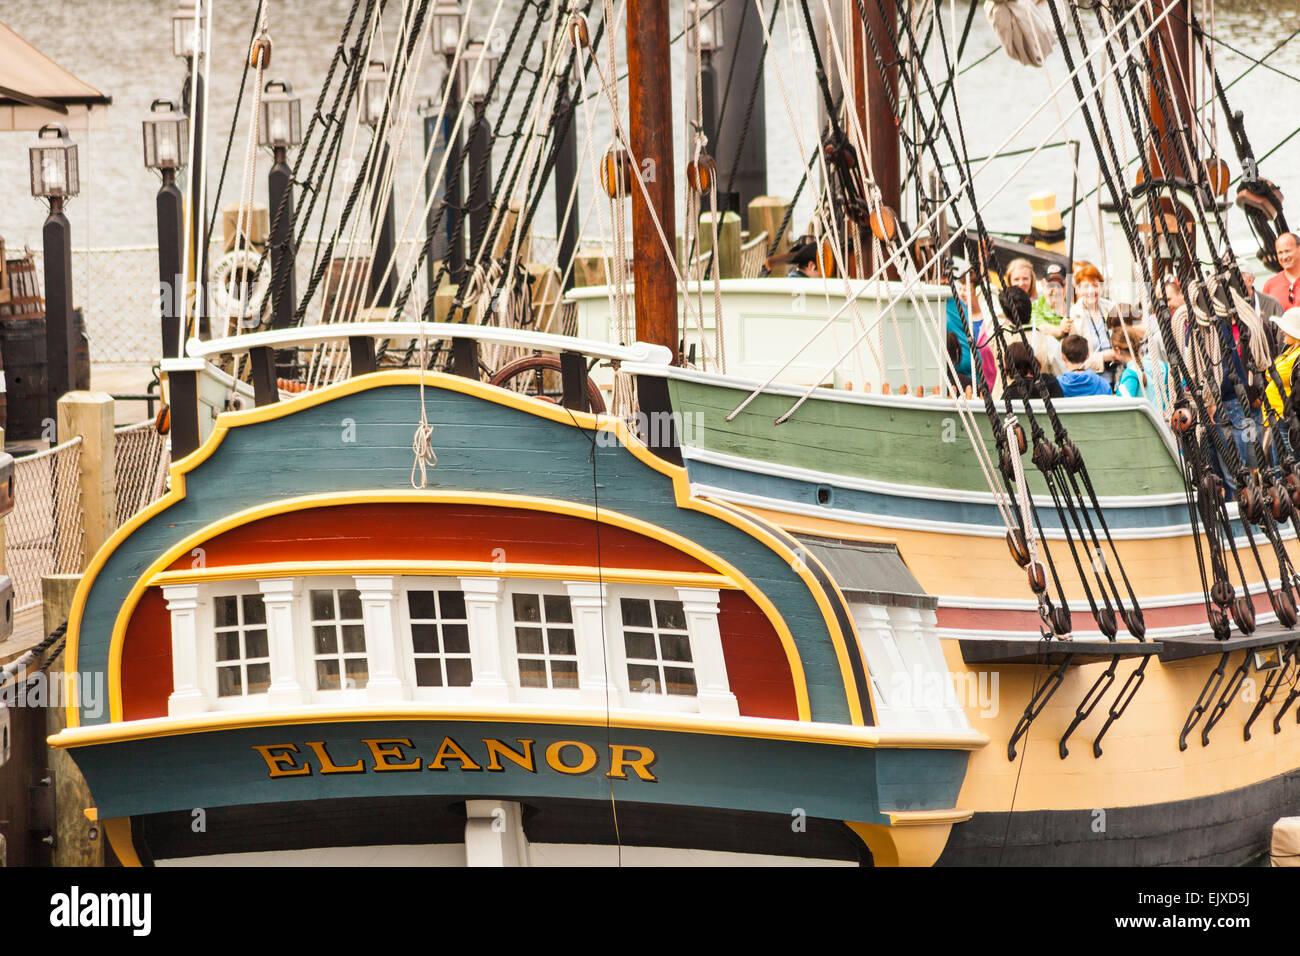 eleanor replica of one of the boston tea party ships outside boston stock photo 80486382 alamy. Black Bedroom Furniture Sets. Home Design Ideas